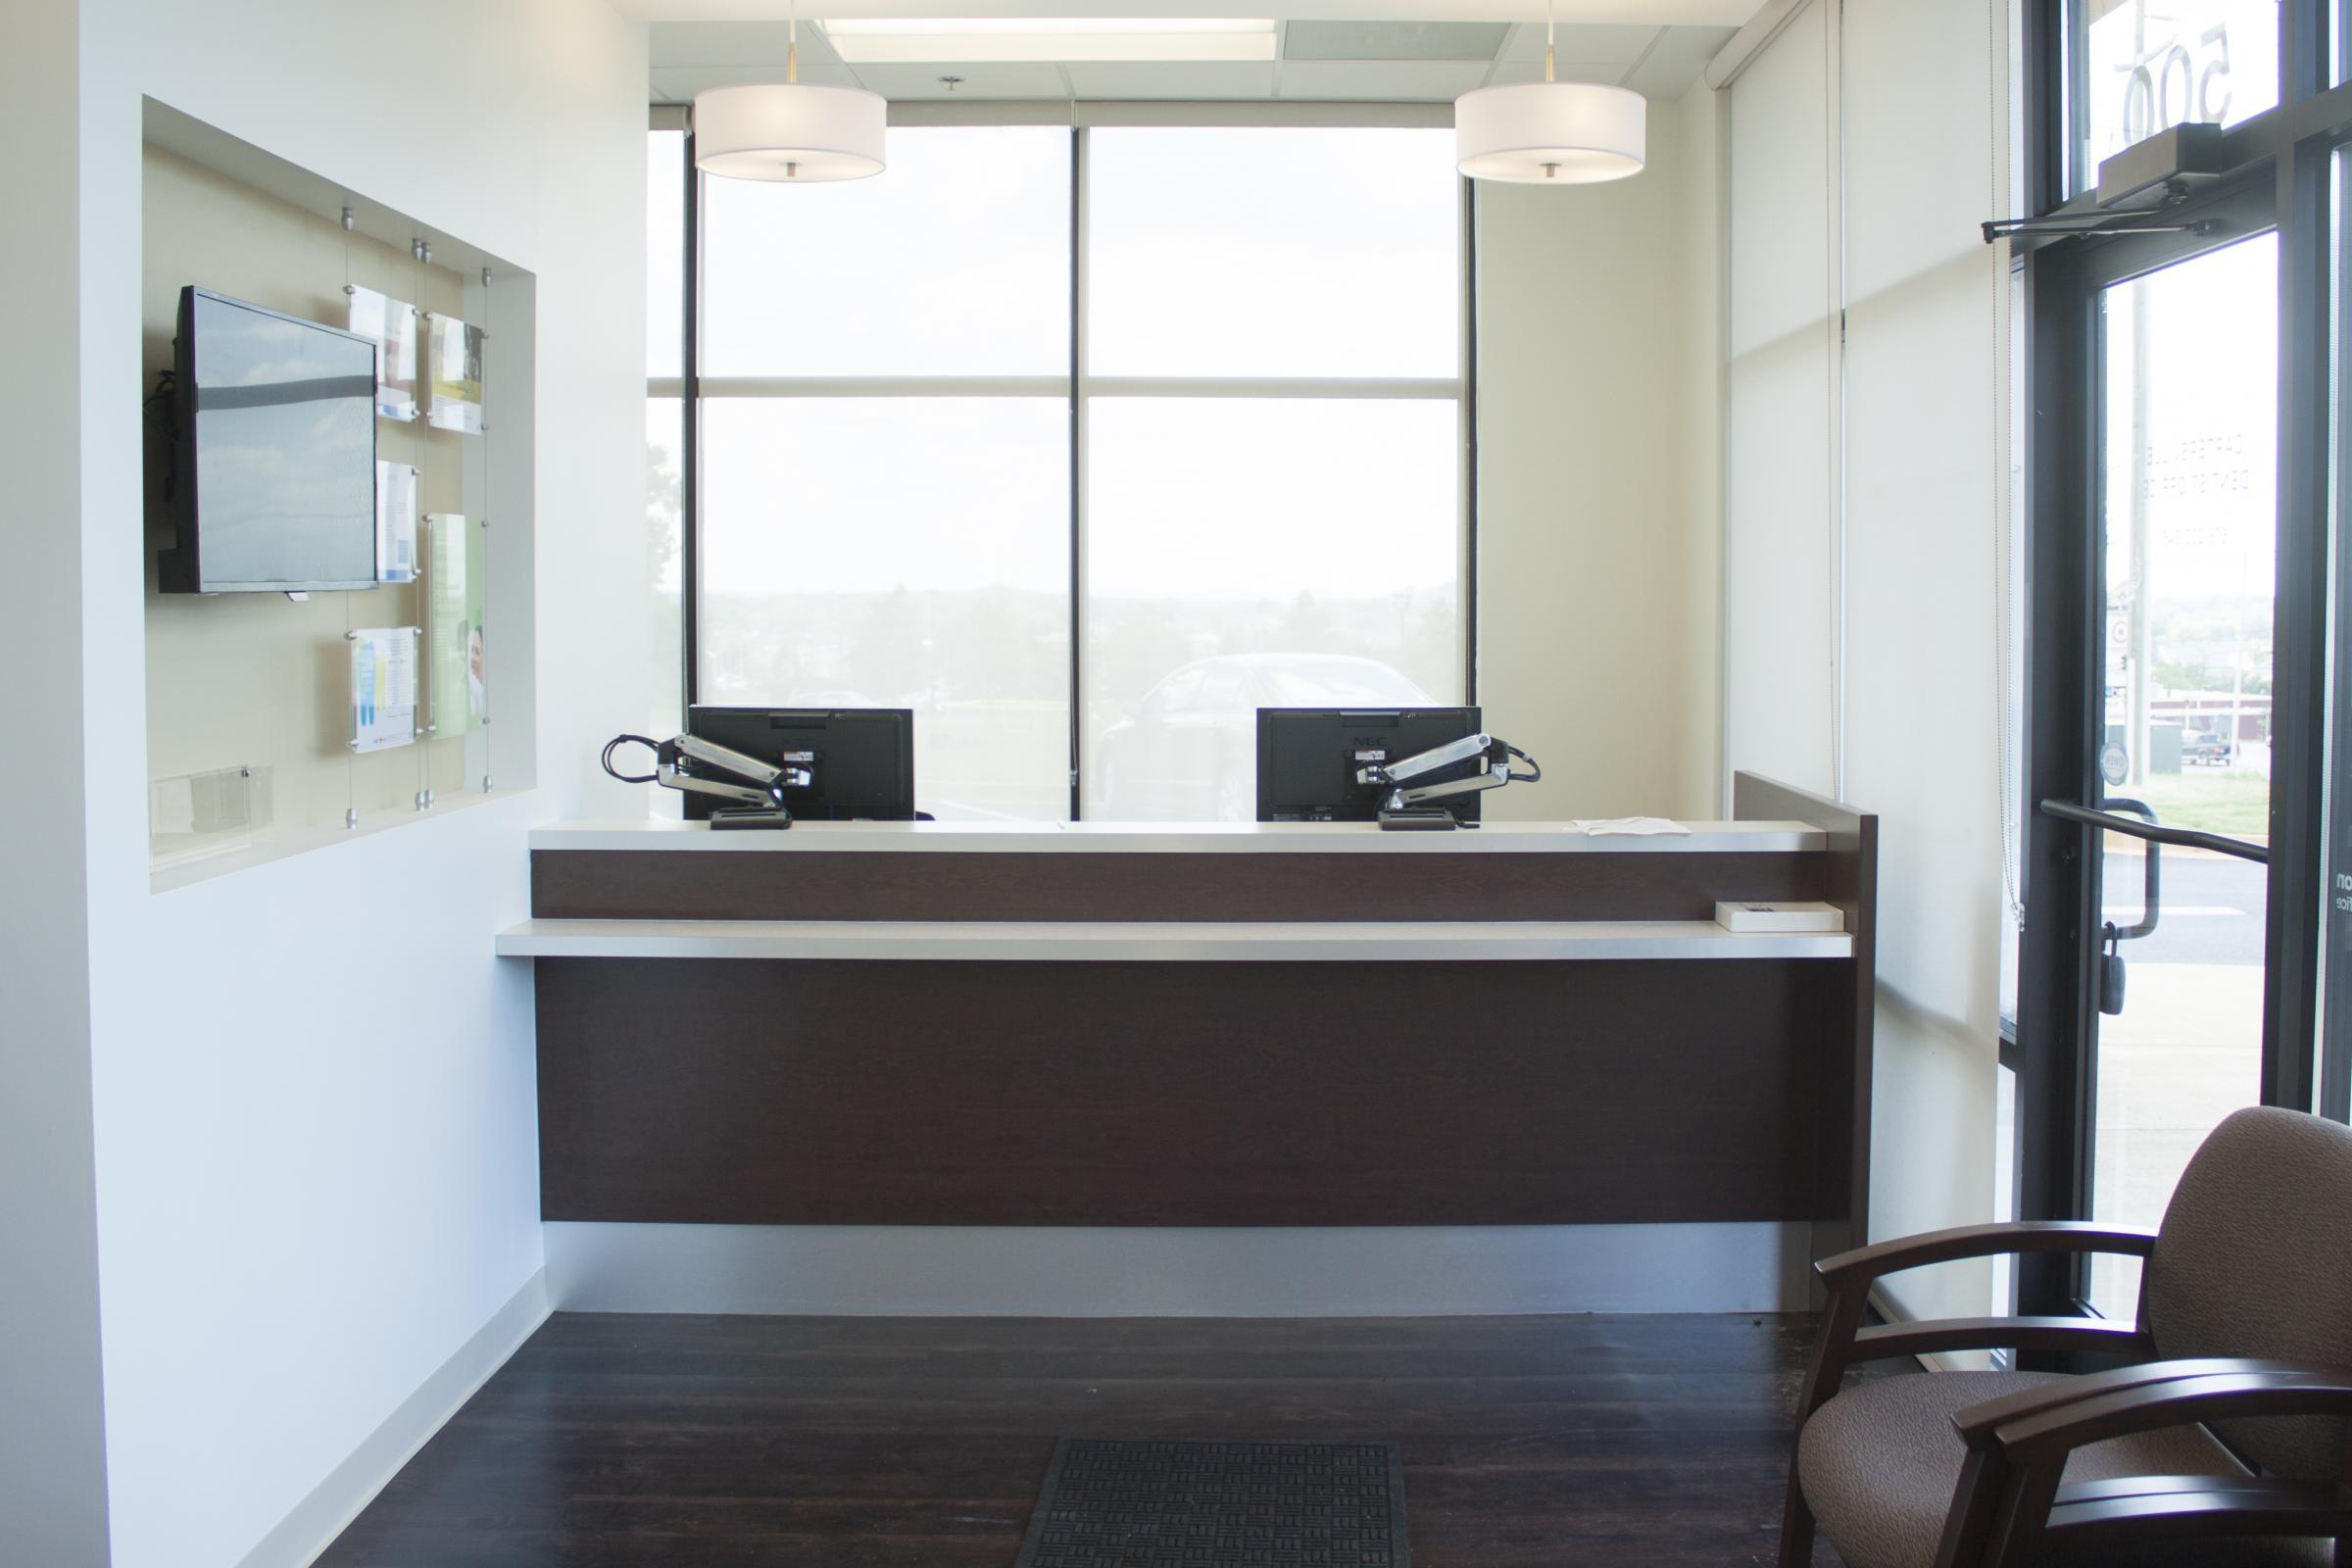 Cartersville Dentist Office image 1